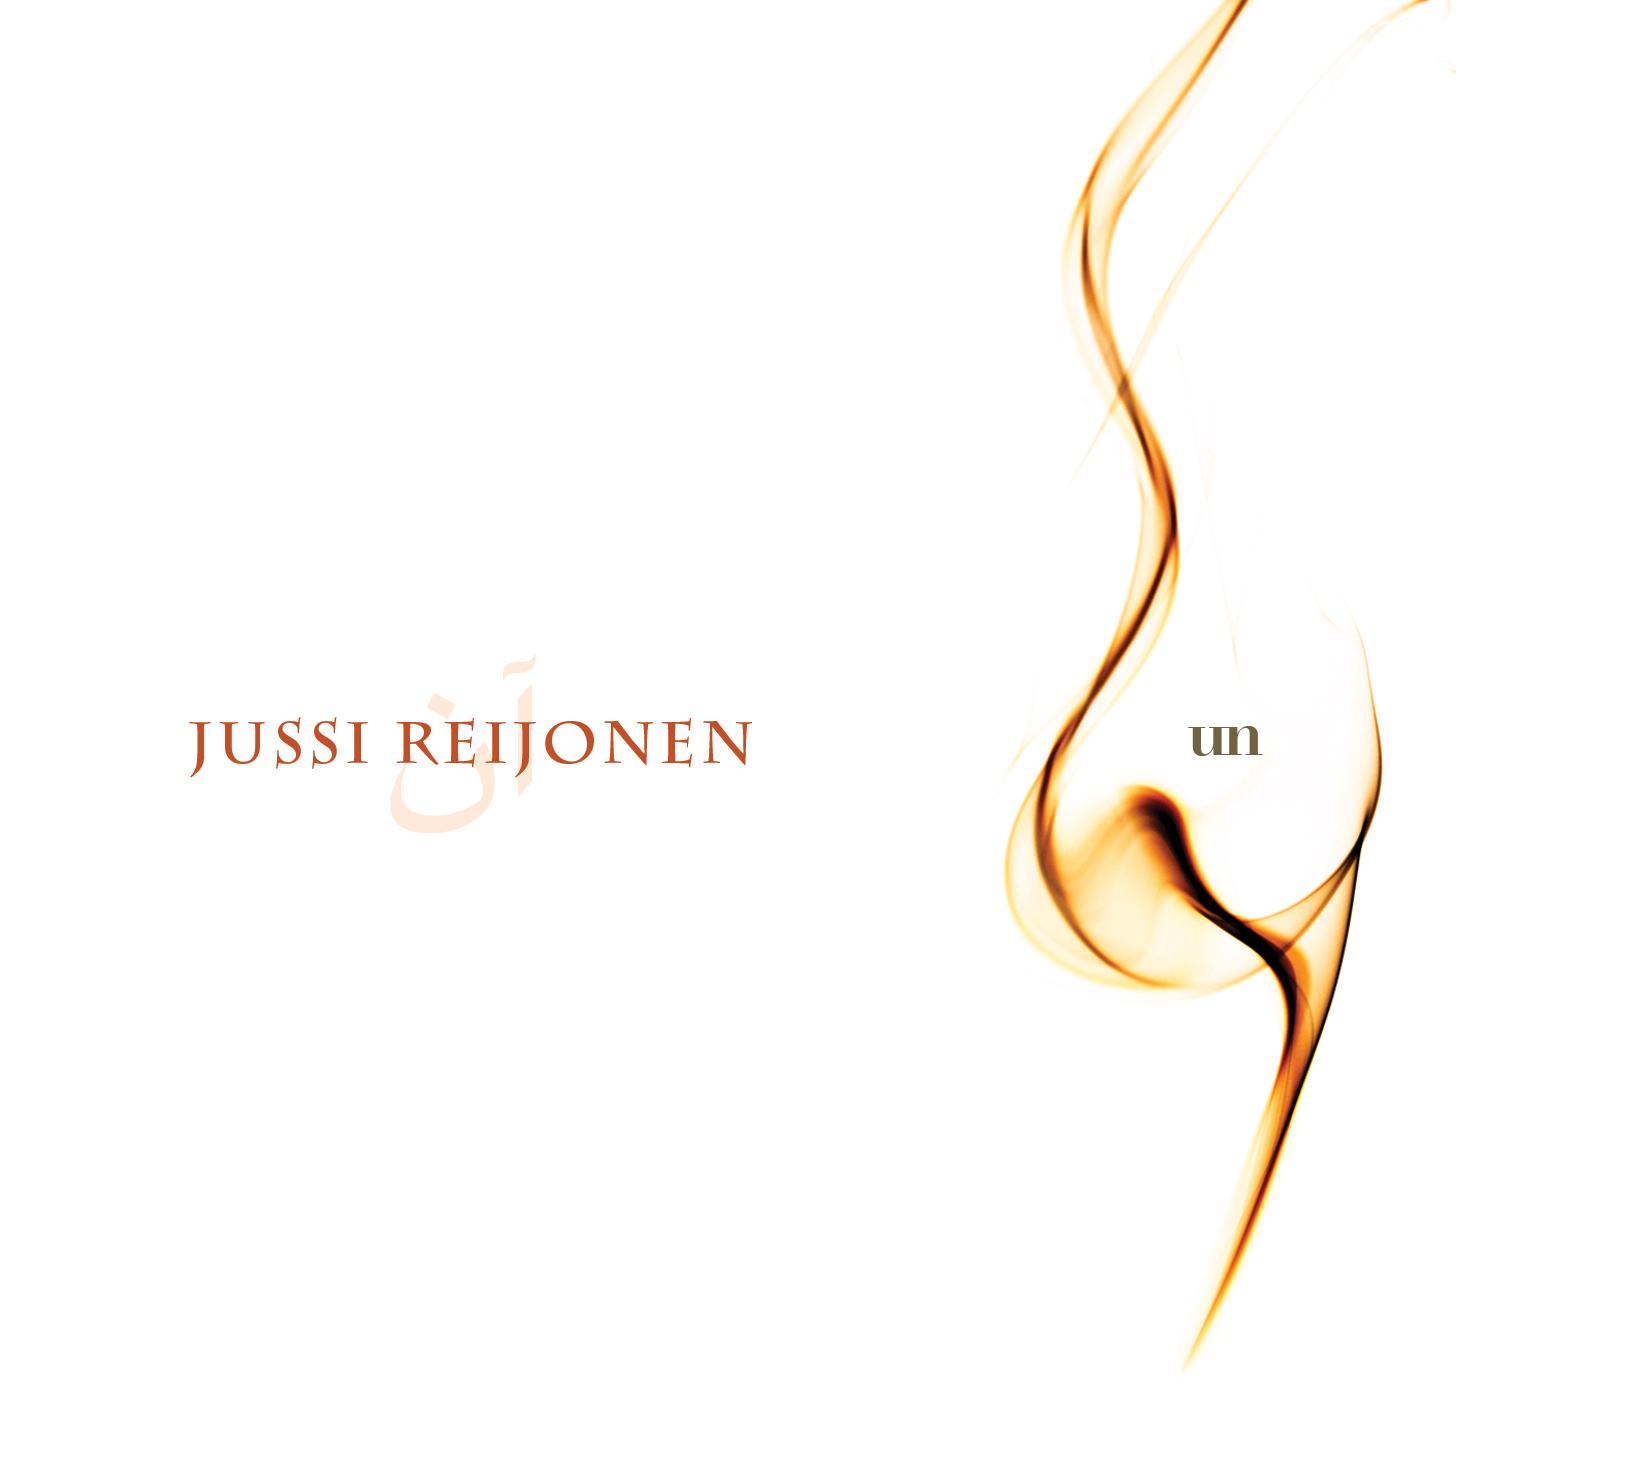 Jussi-Reijonen-Un.jpg